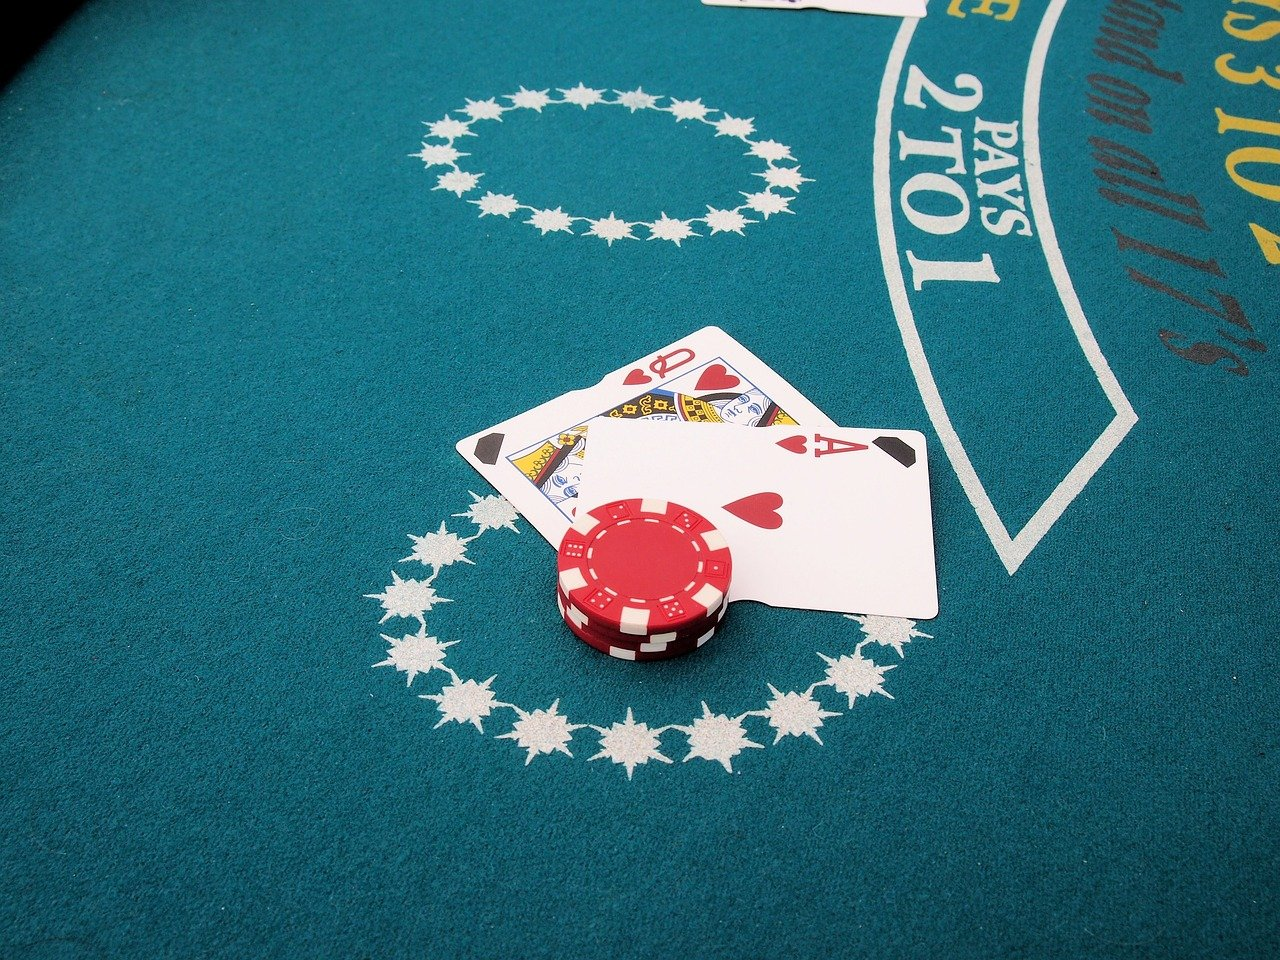 Top 5 Winning Blackjack Tips